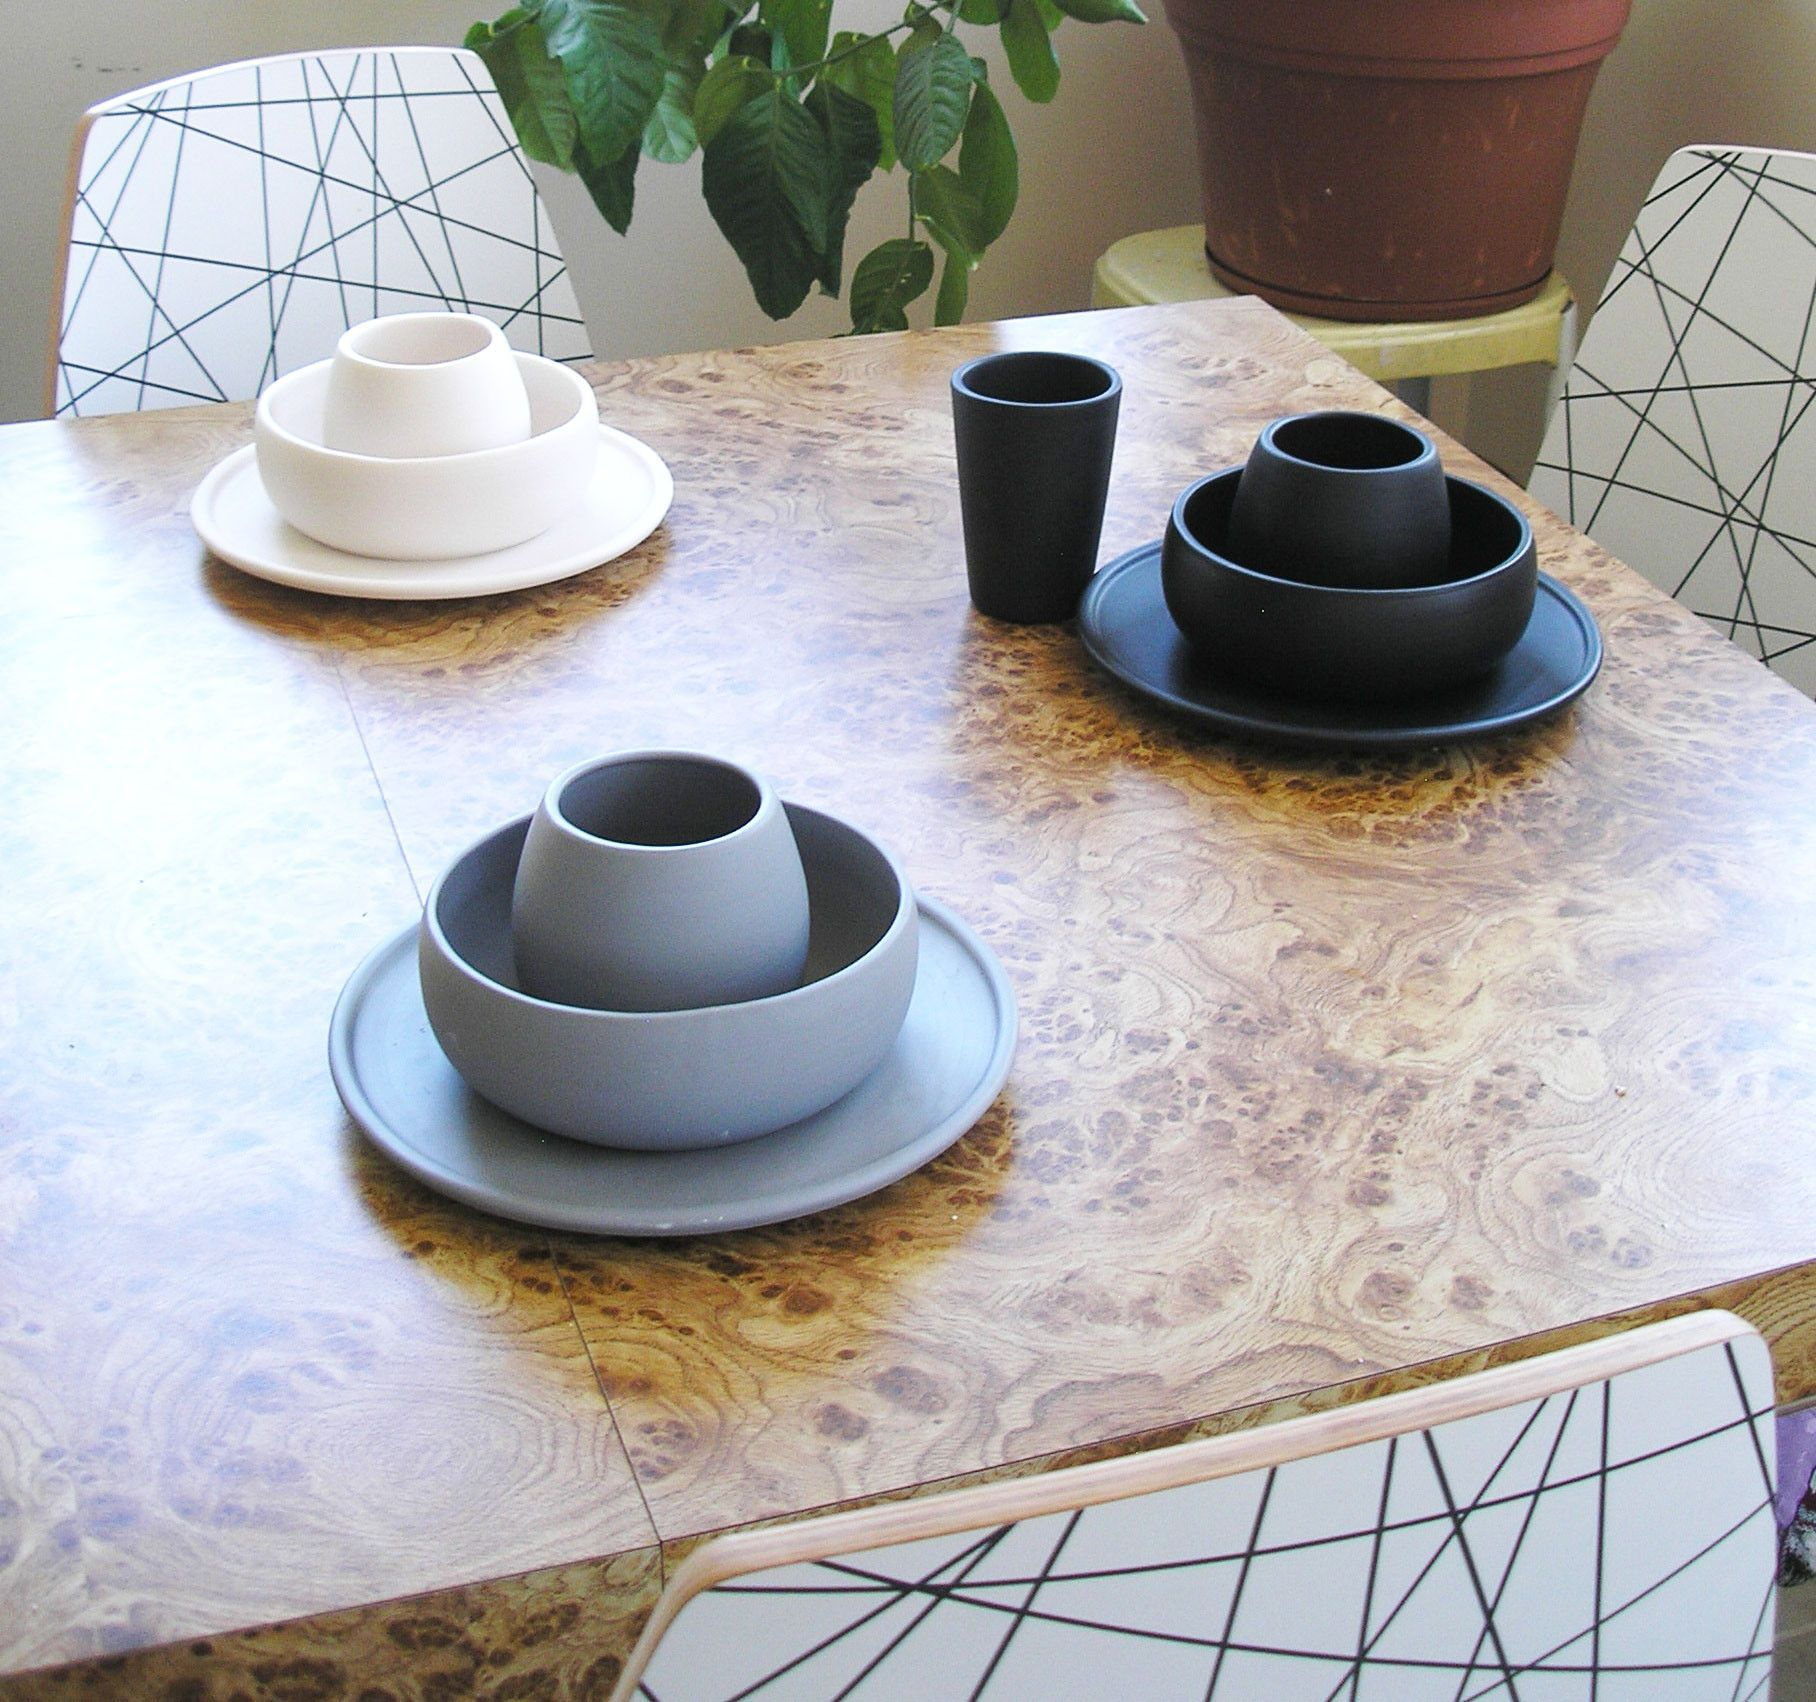 Matte Black Porcelain USA Made Dinner Plate & Matte Black Porcelain USA Made Dinner Plate   Faves   Pinterest ...